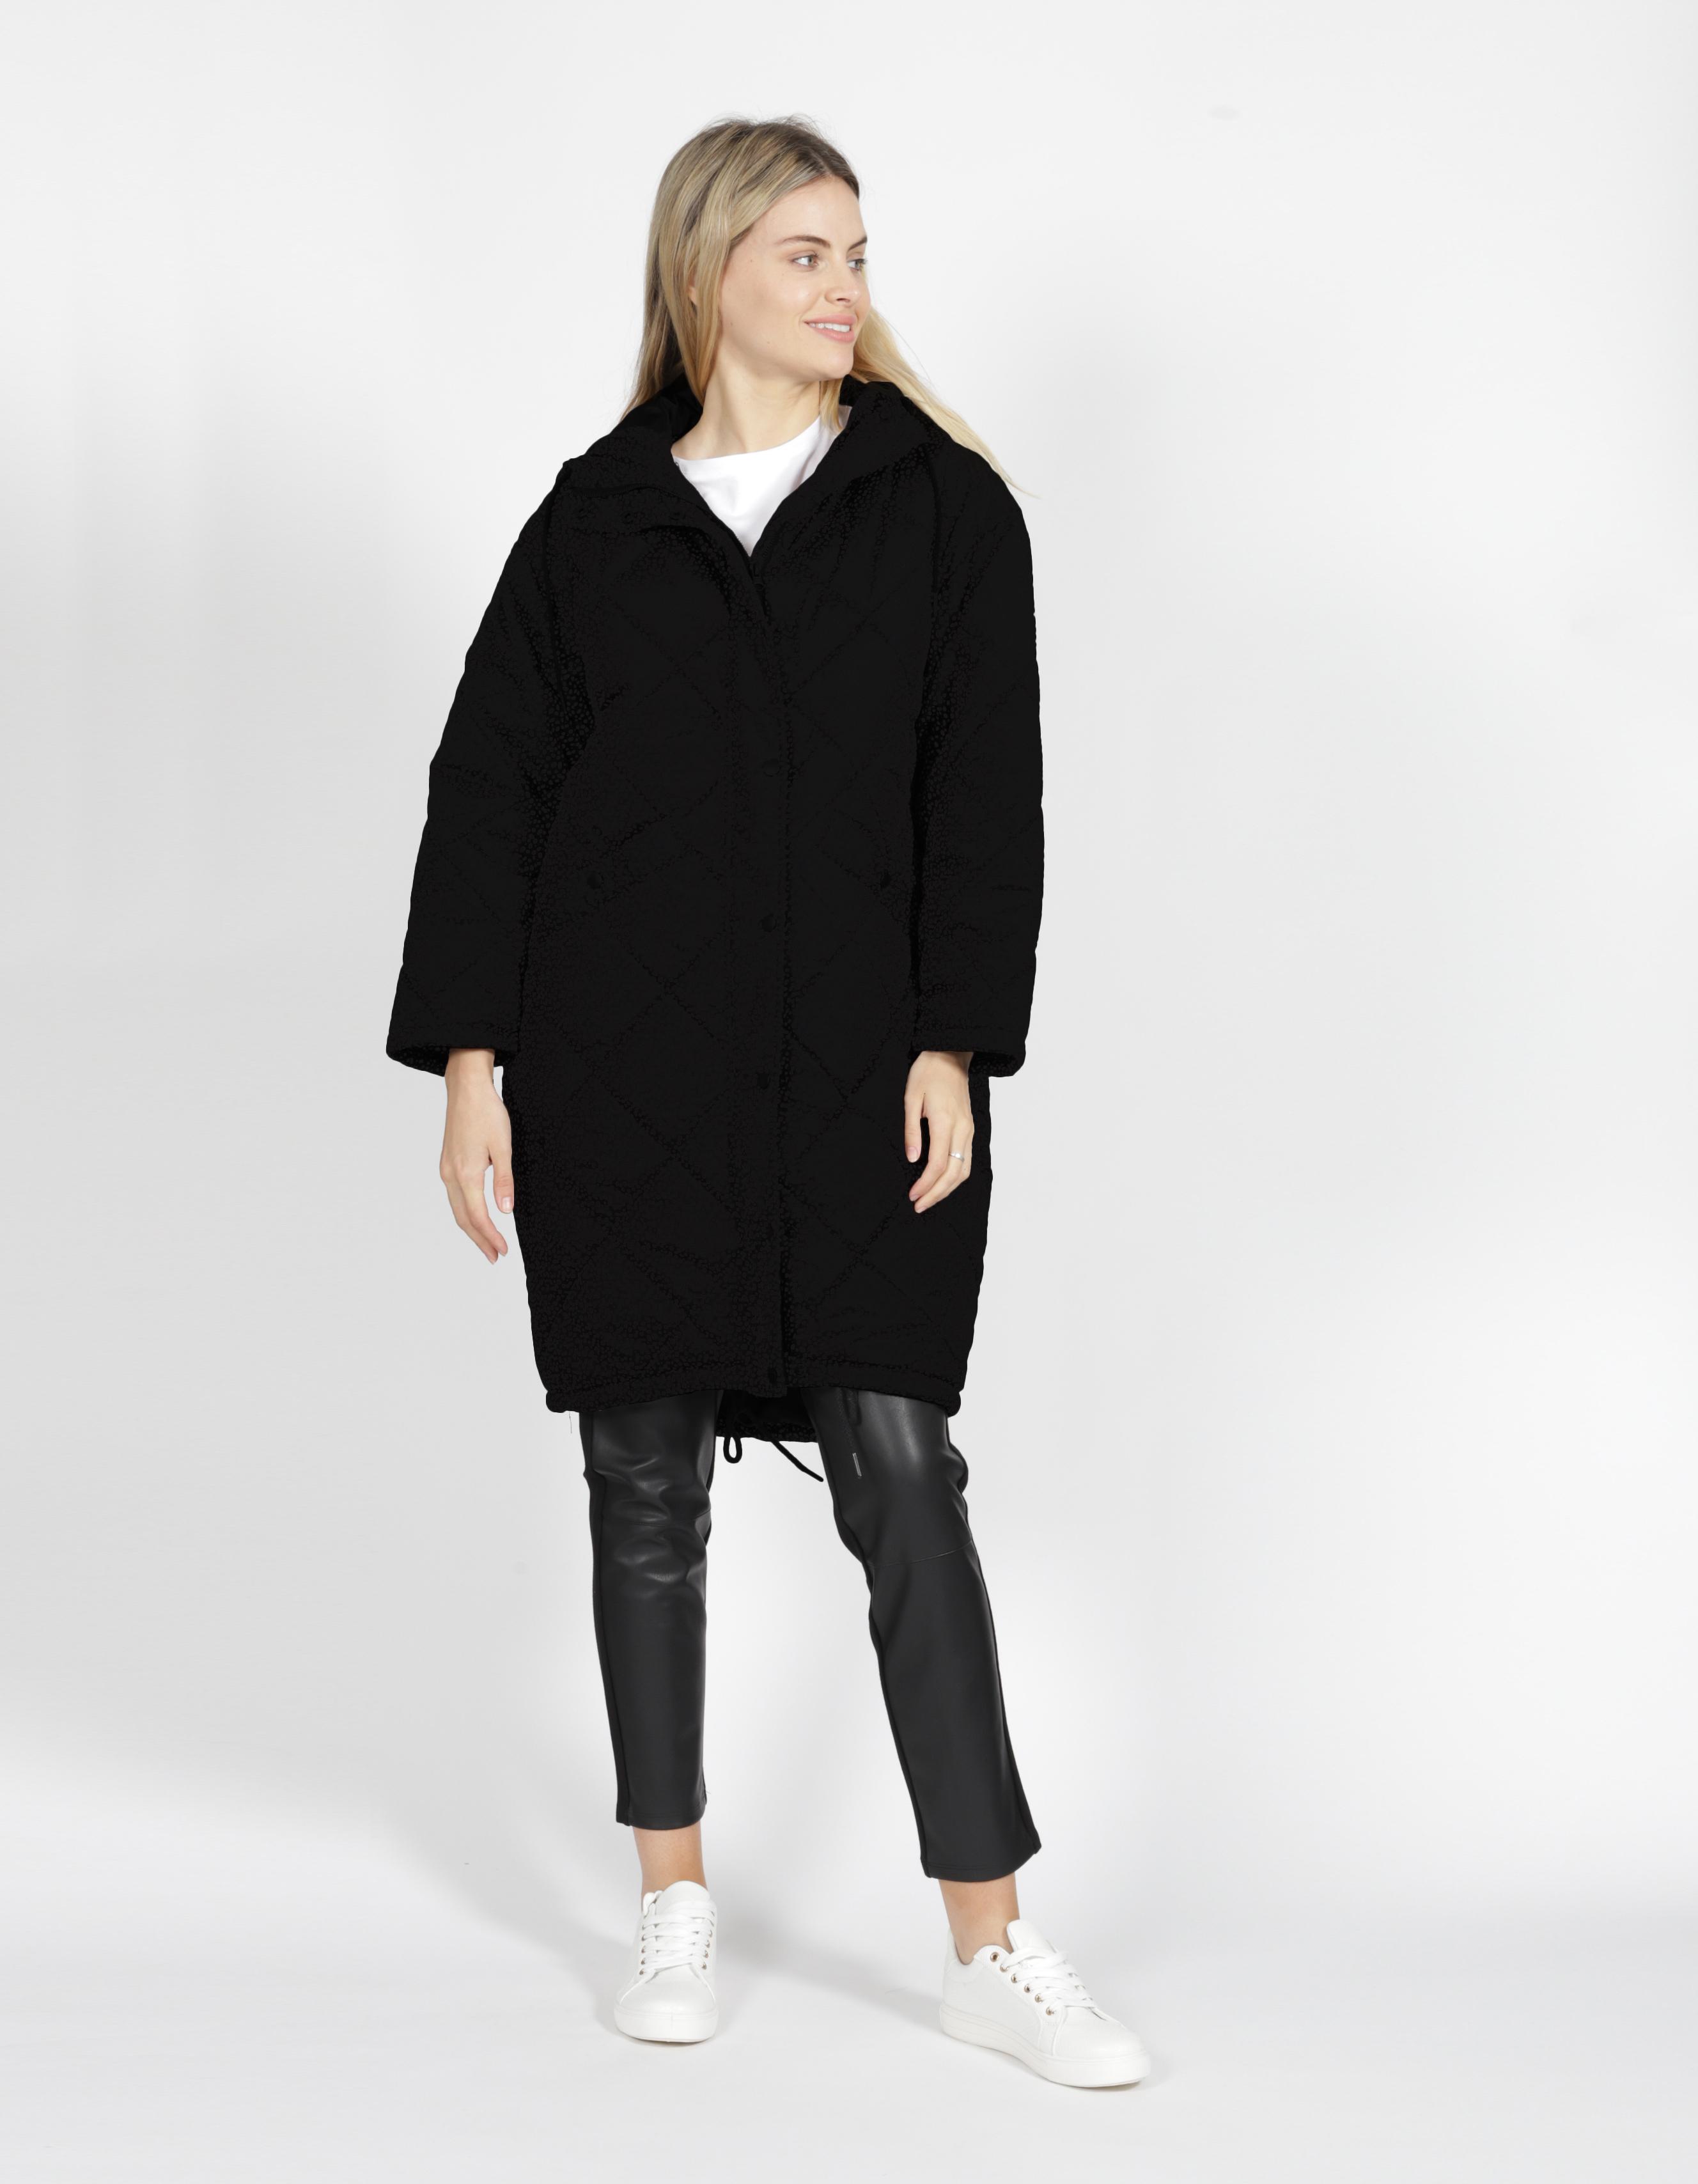 Sass Madison Puffer Jacket Black